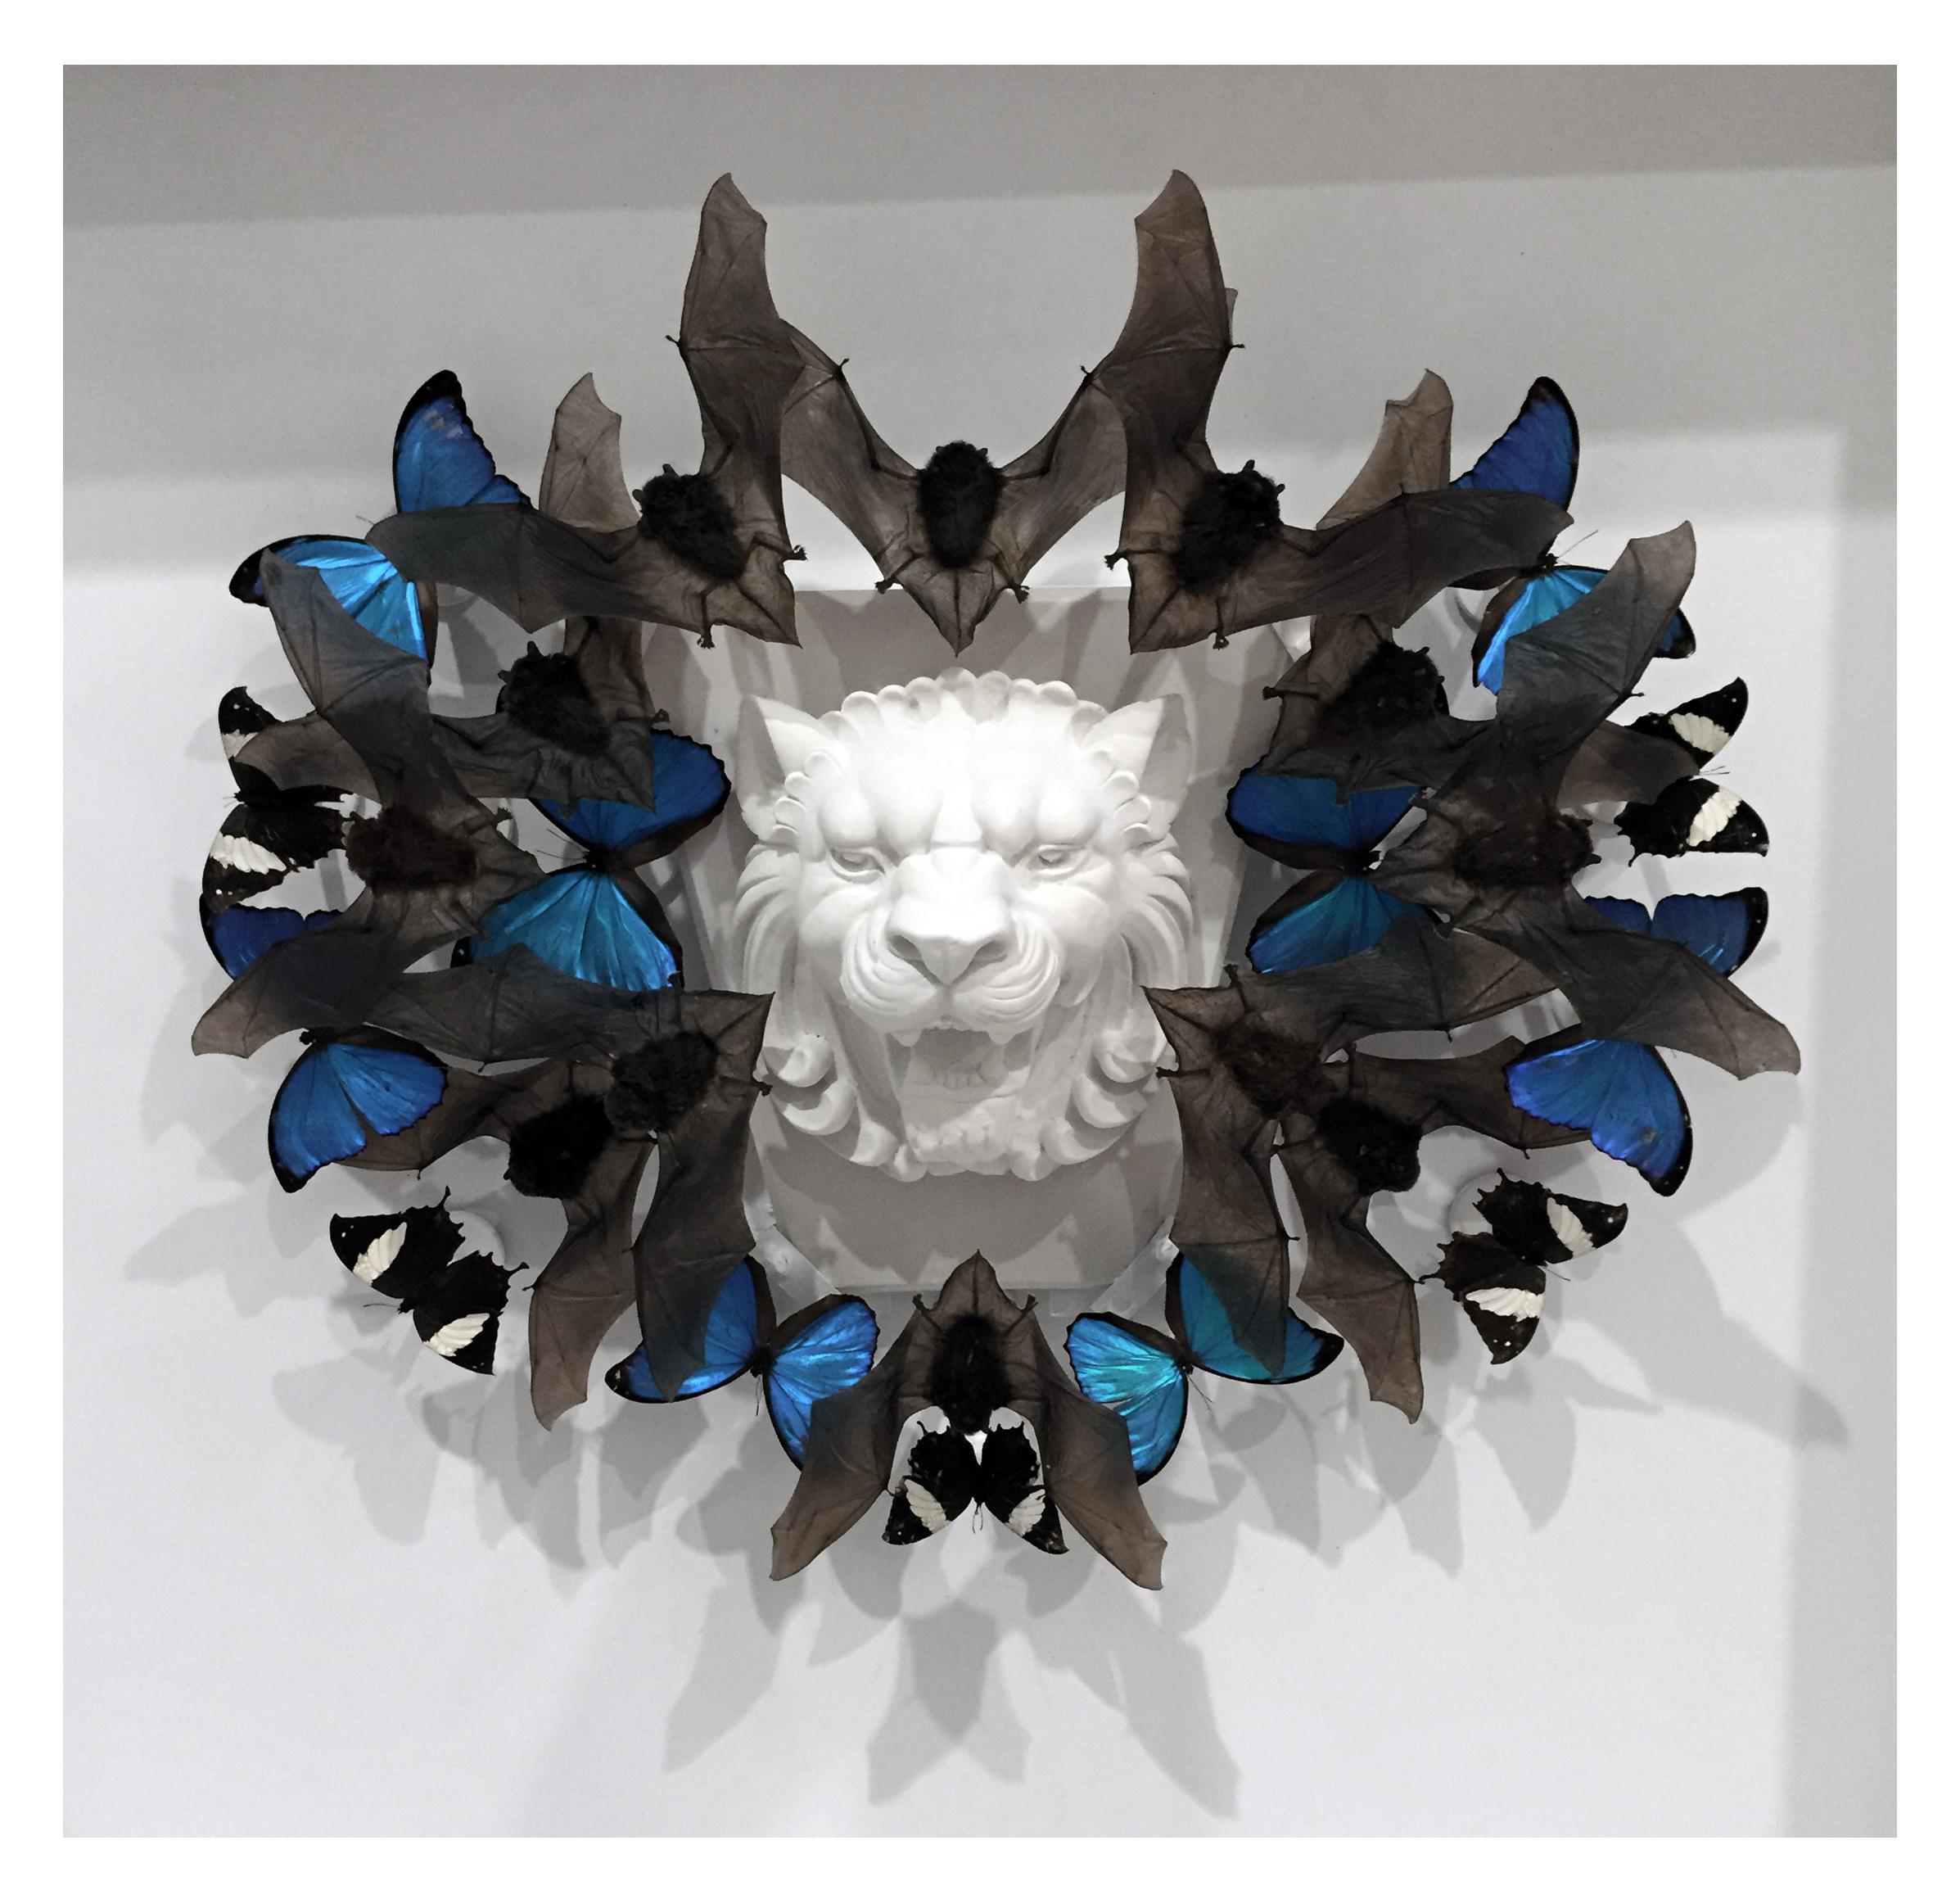 "Joseph Grazi, ""Scar"" 2016. Taxidermy bats, dried butterflies, and stone sculpture on wood mounted in plexiglass. 34"" x 34"" x 8""."